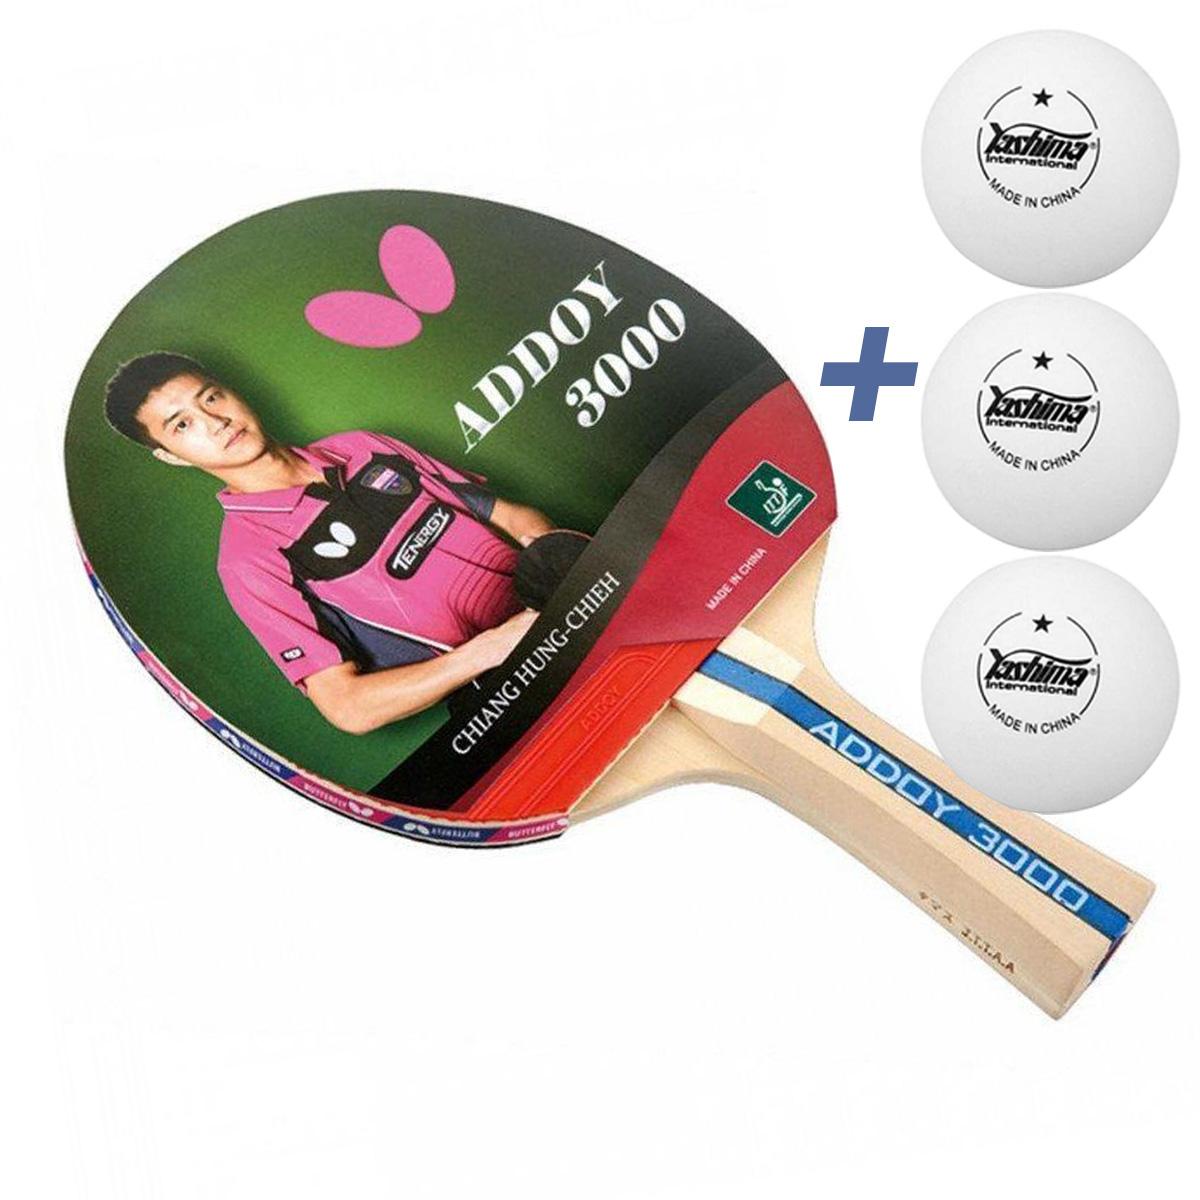 Raquete de tenis de Mesa Butterfly Addoy 3000 New  2020- Chiang Hung (Chieh) + Brinde 3 Bolinhas  - REAL ESPORTE